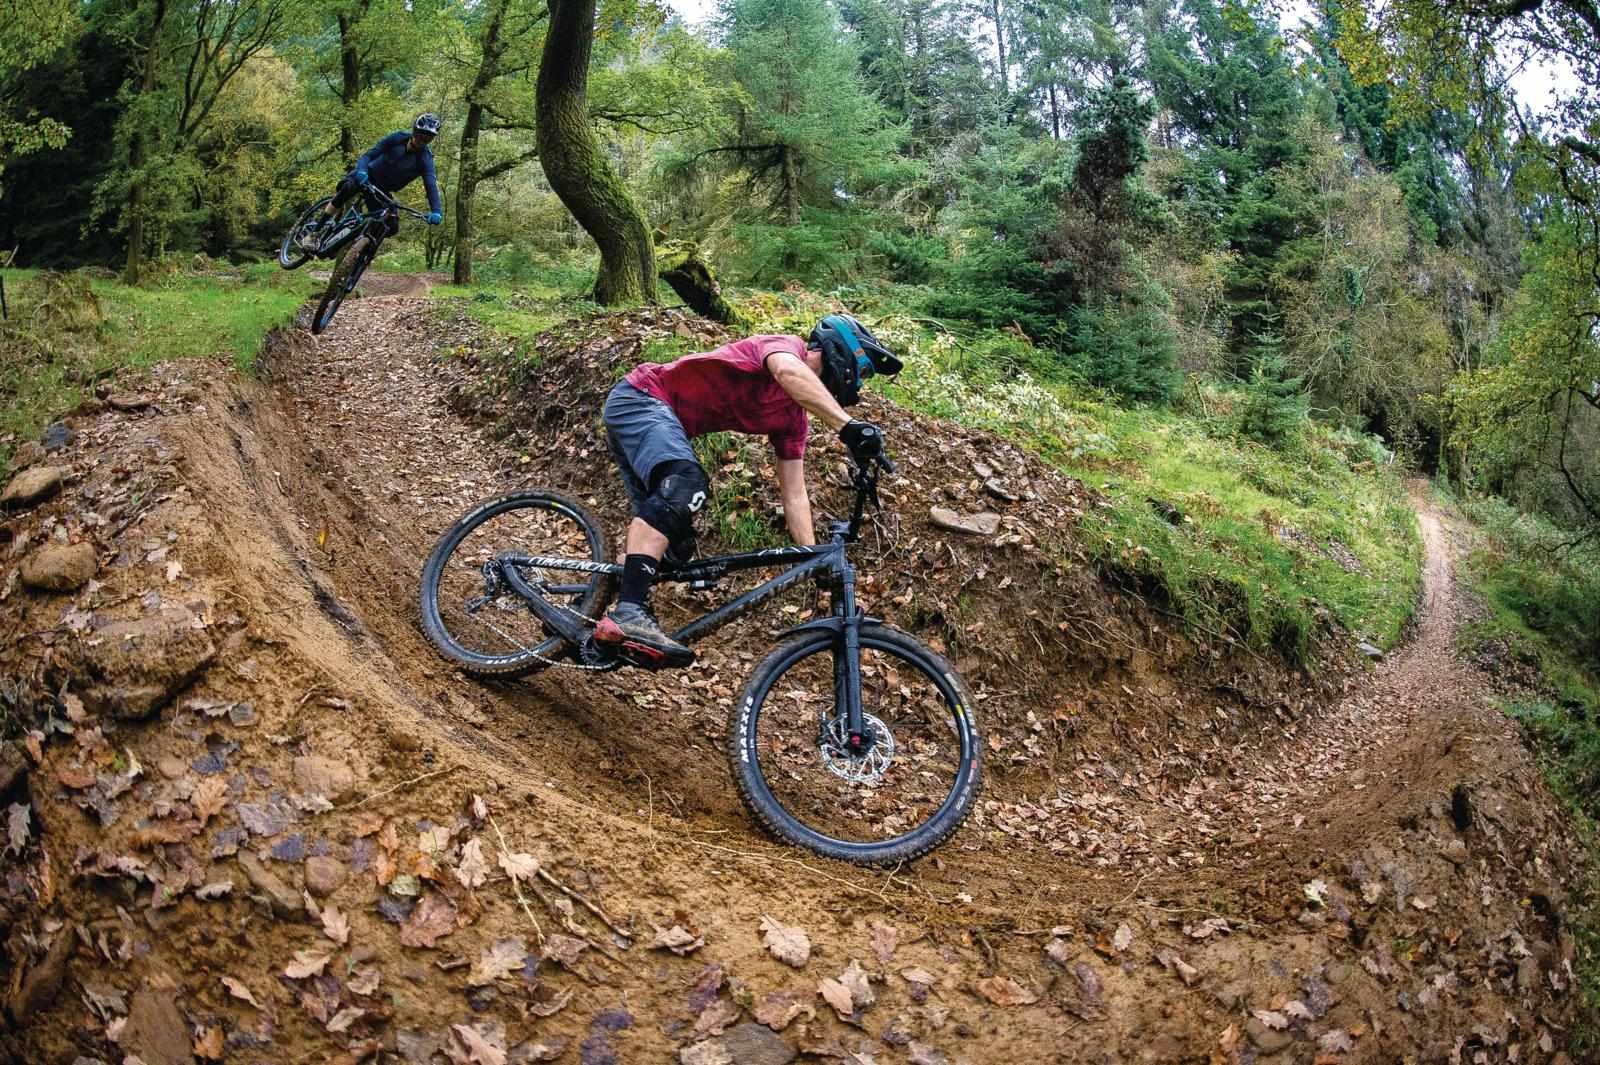 Bike Park Wales